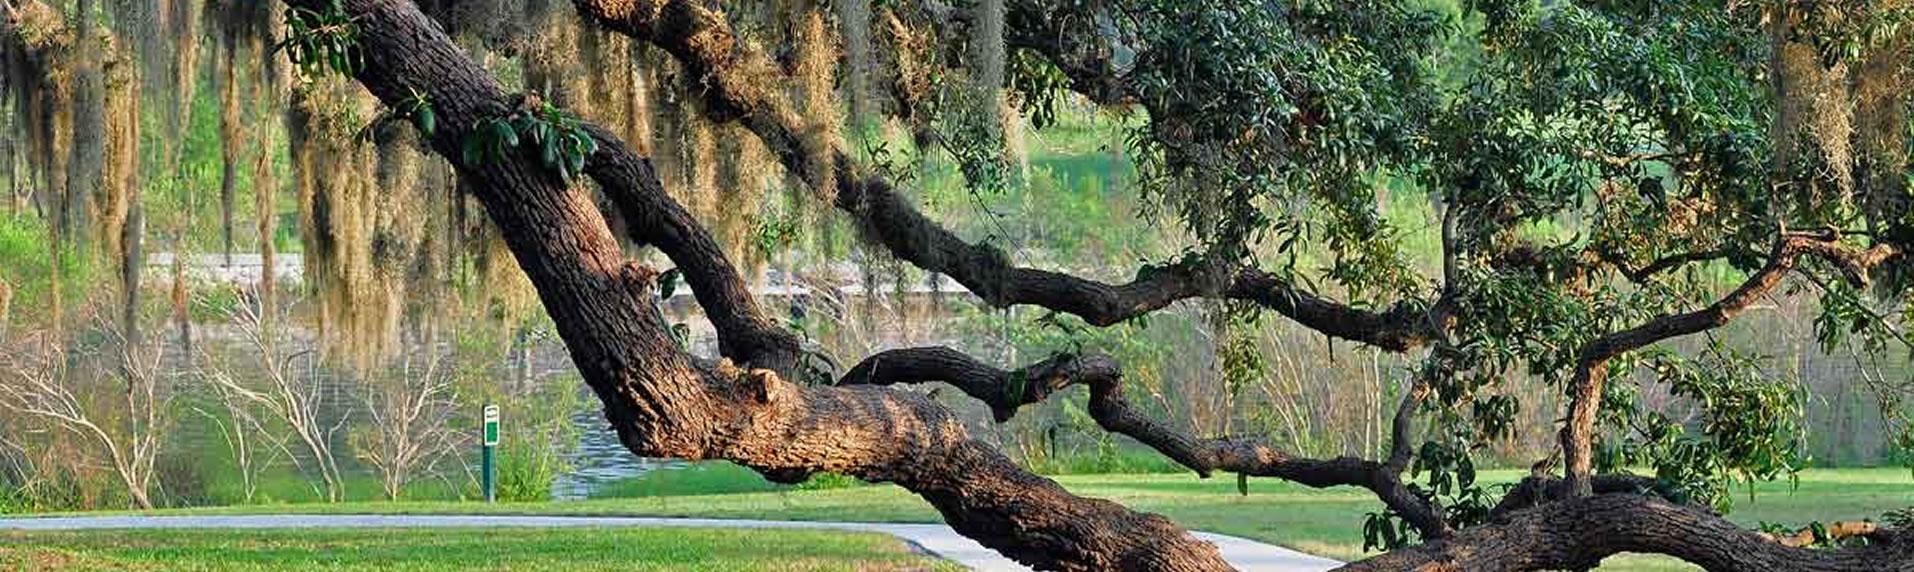 Oak tree in Rivercrest Park